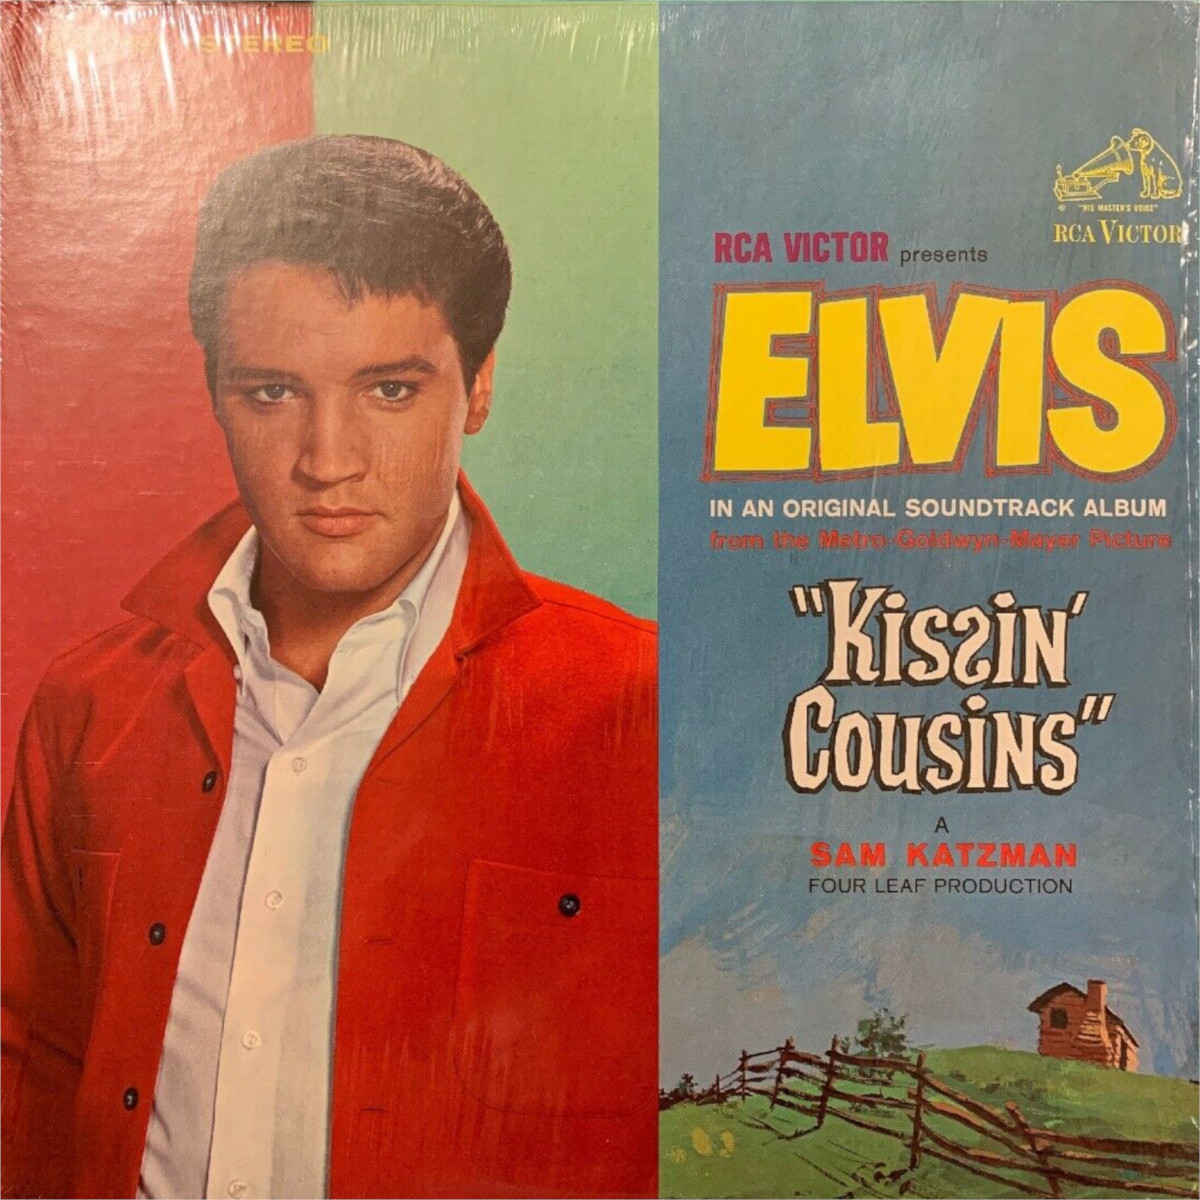 KISSIN' COUSINS Lsp-2894-68-10ikjj